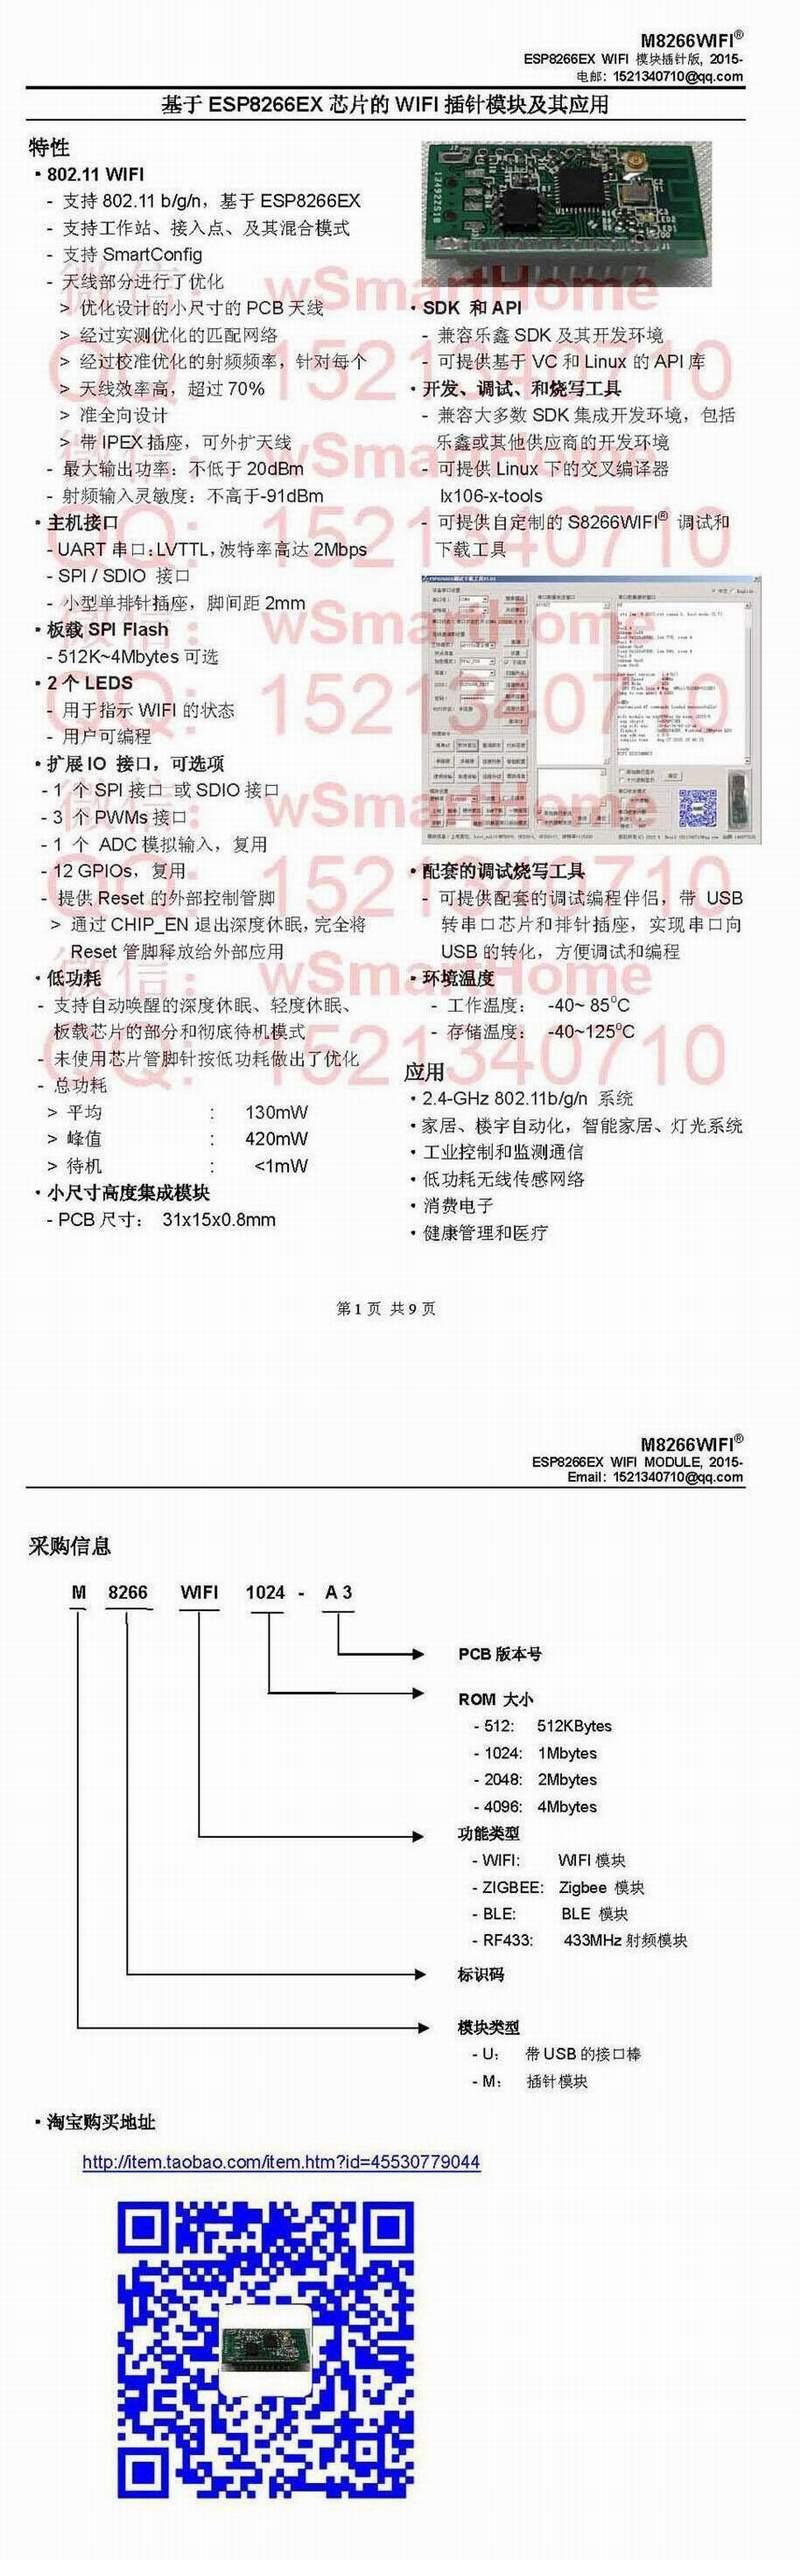 M8266WIFI产品简介